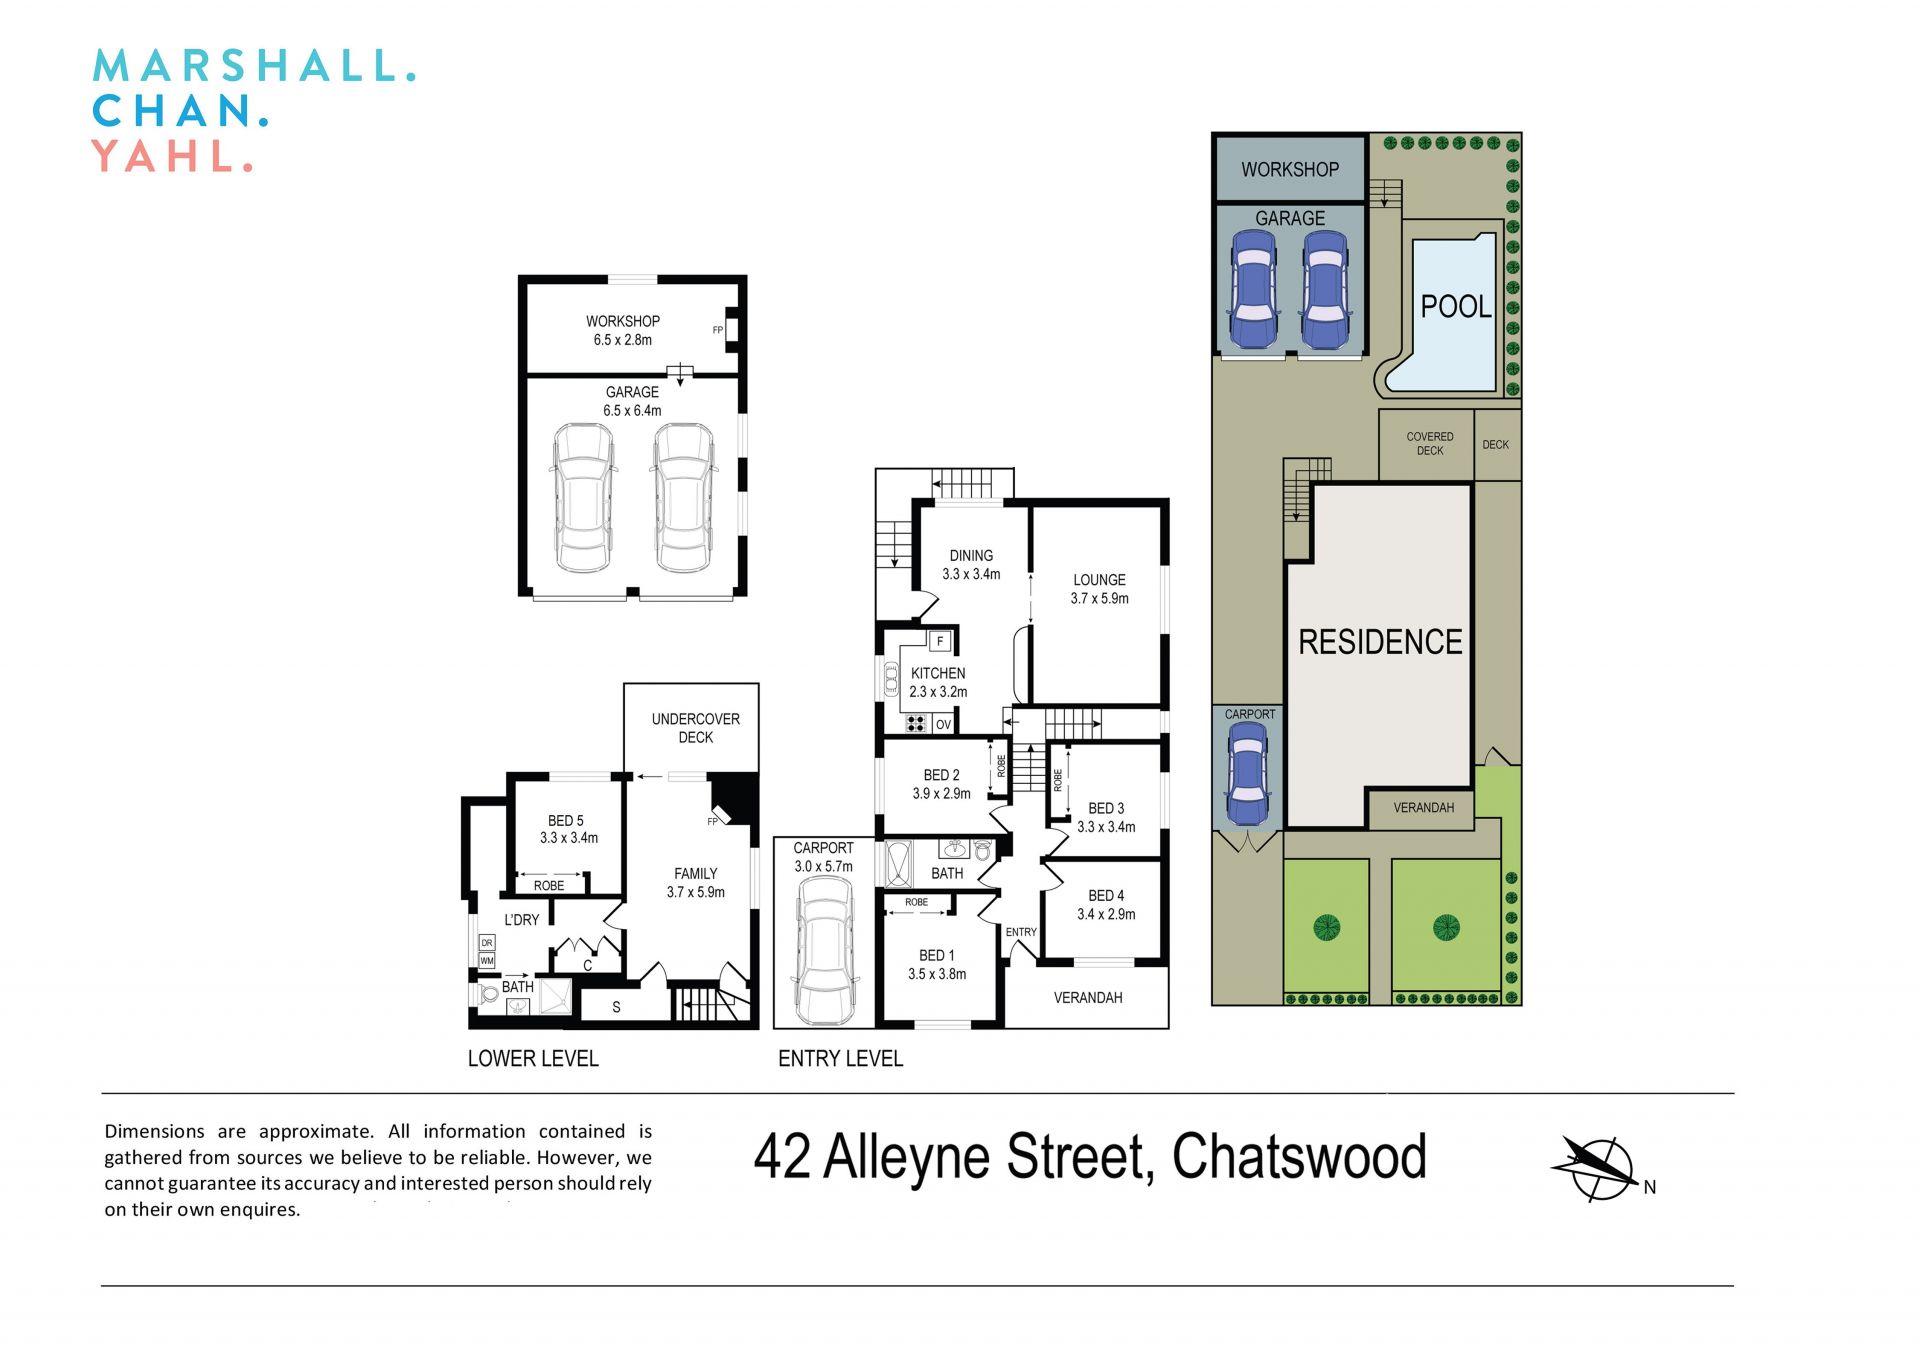 42 Alleyne Street Chatswood 2067